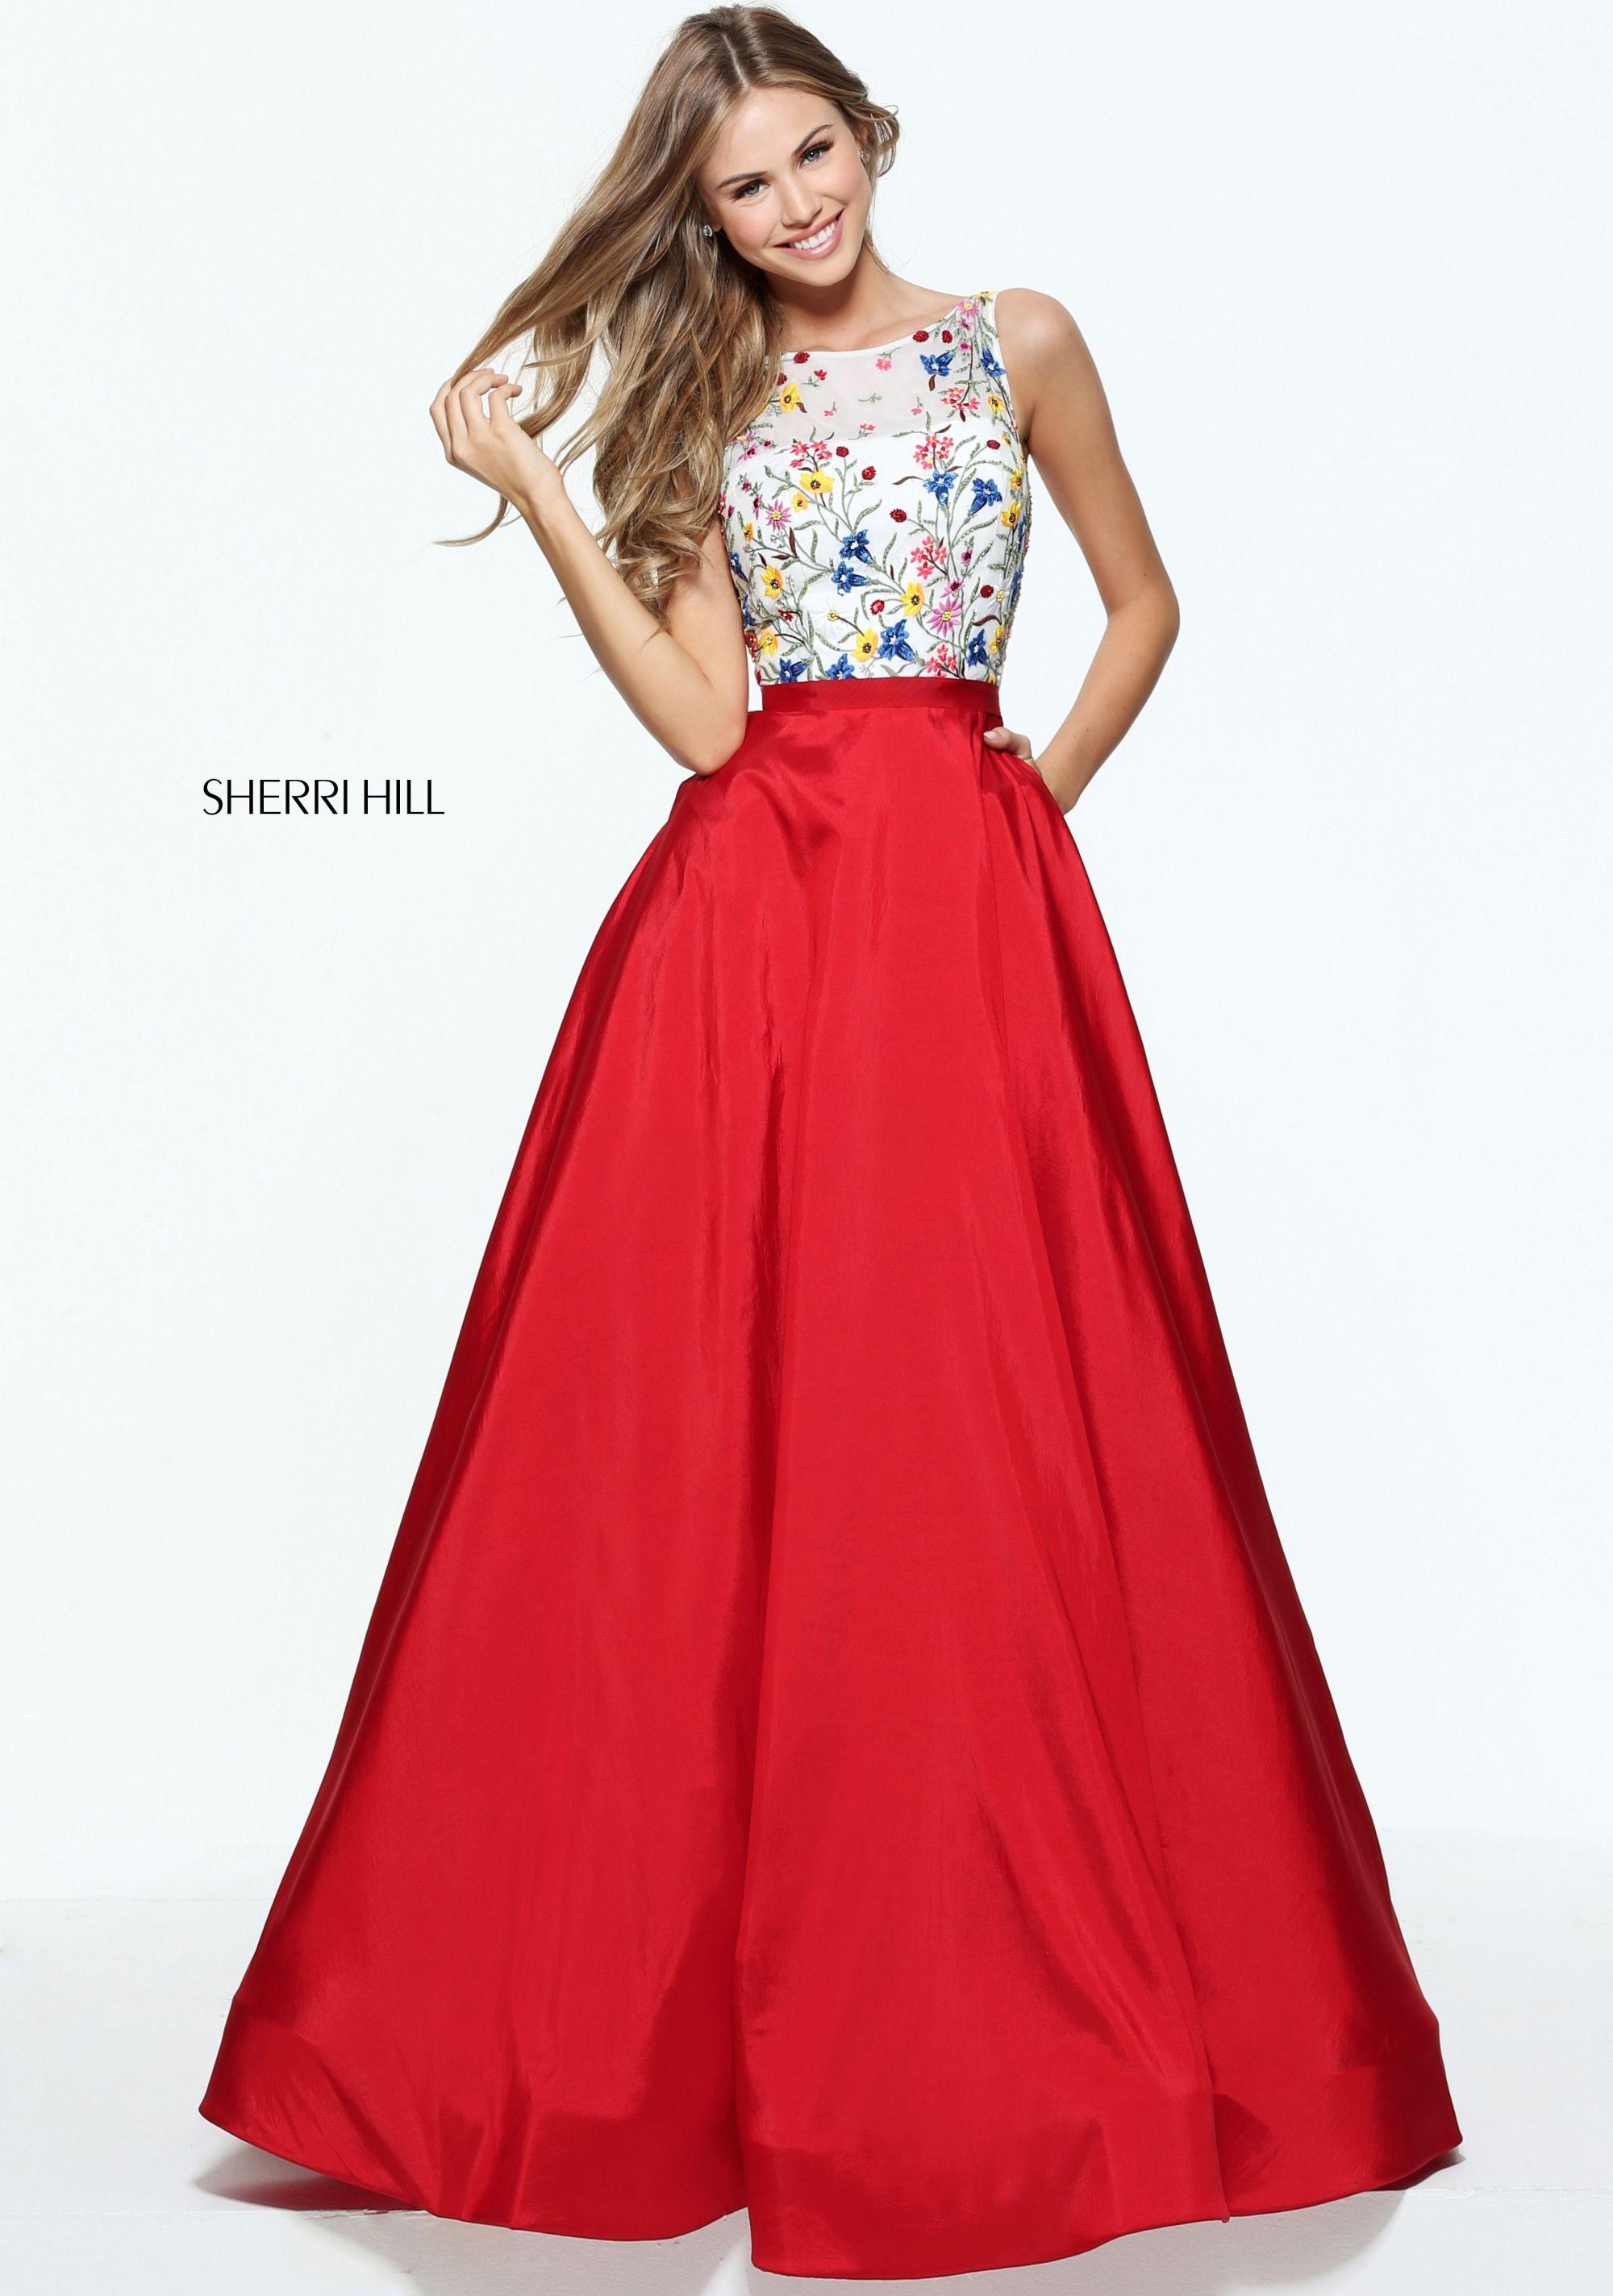 Sherri Hill 51037 | Pinterest | Prom, Sherri hill prom dresses and ...